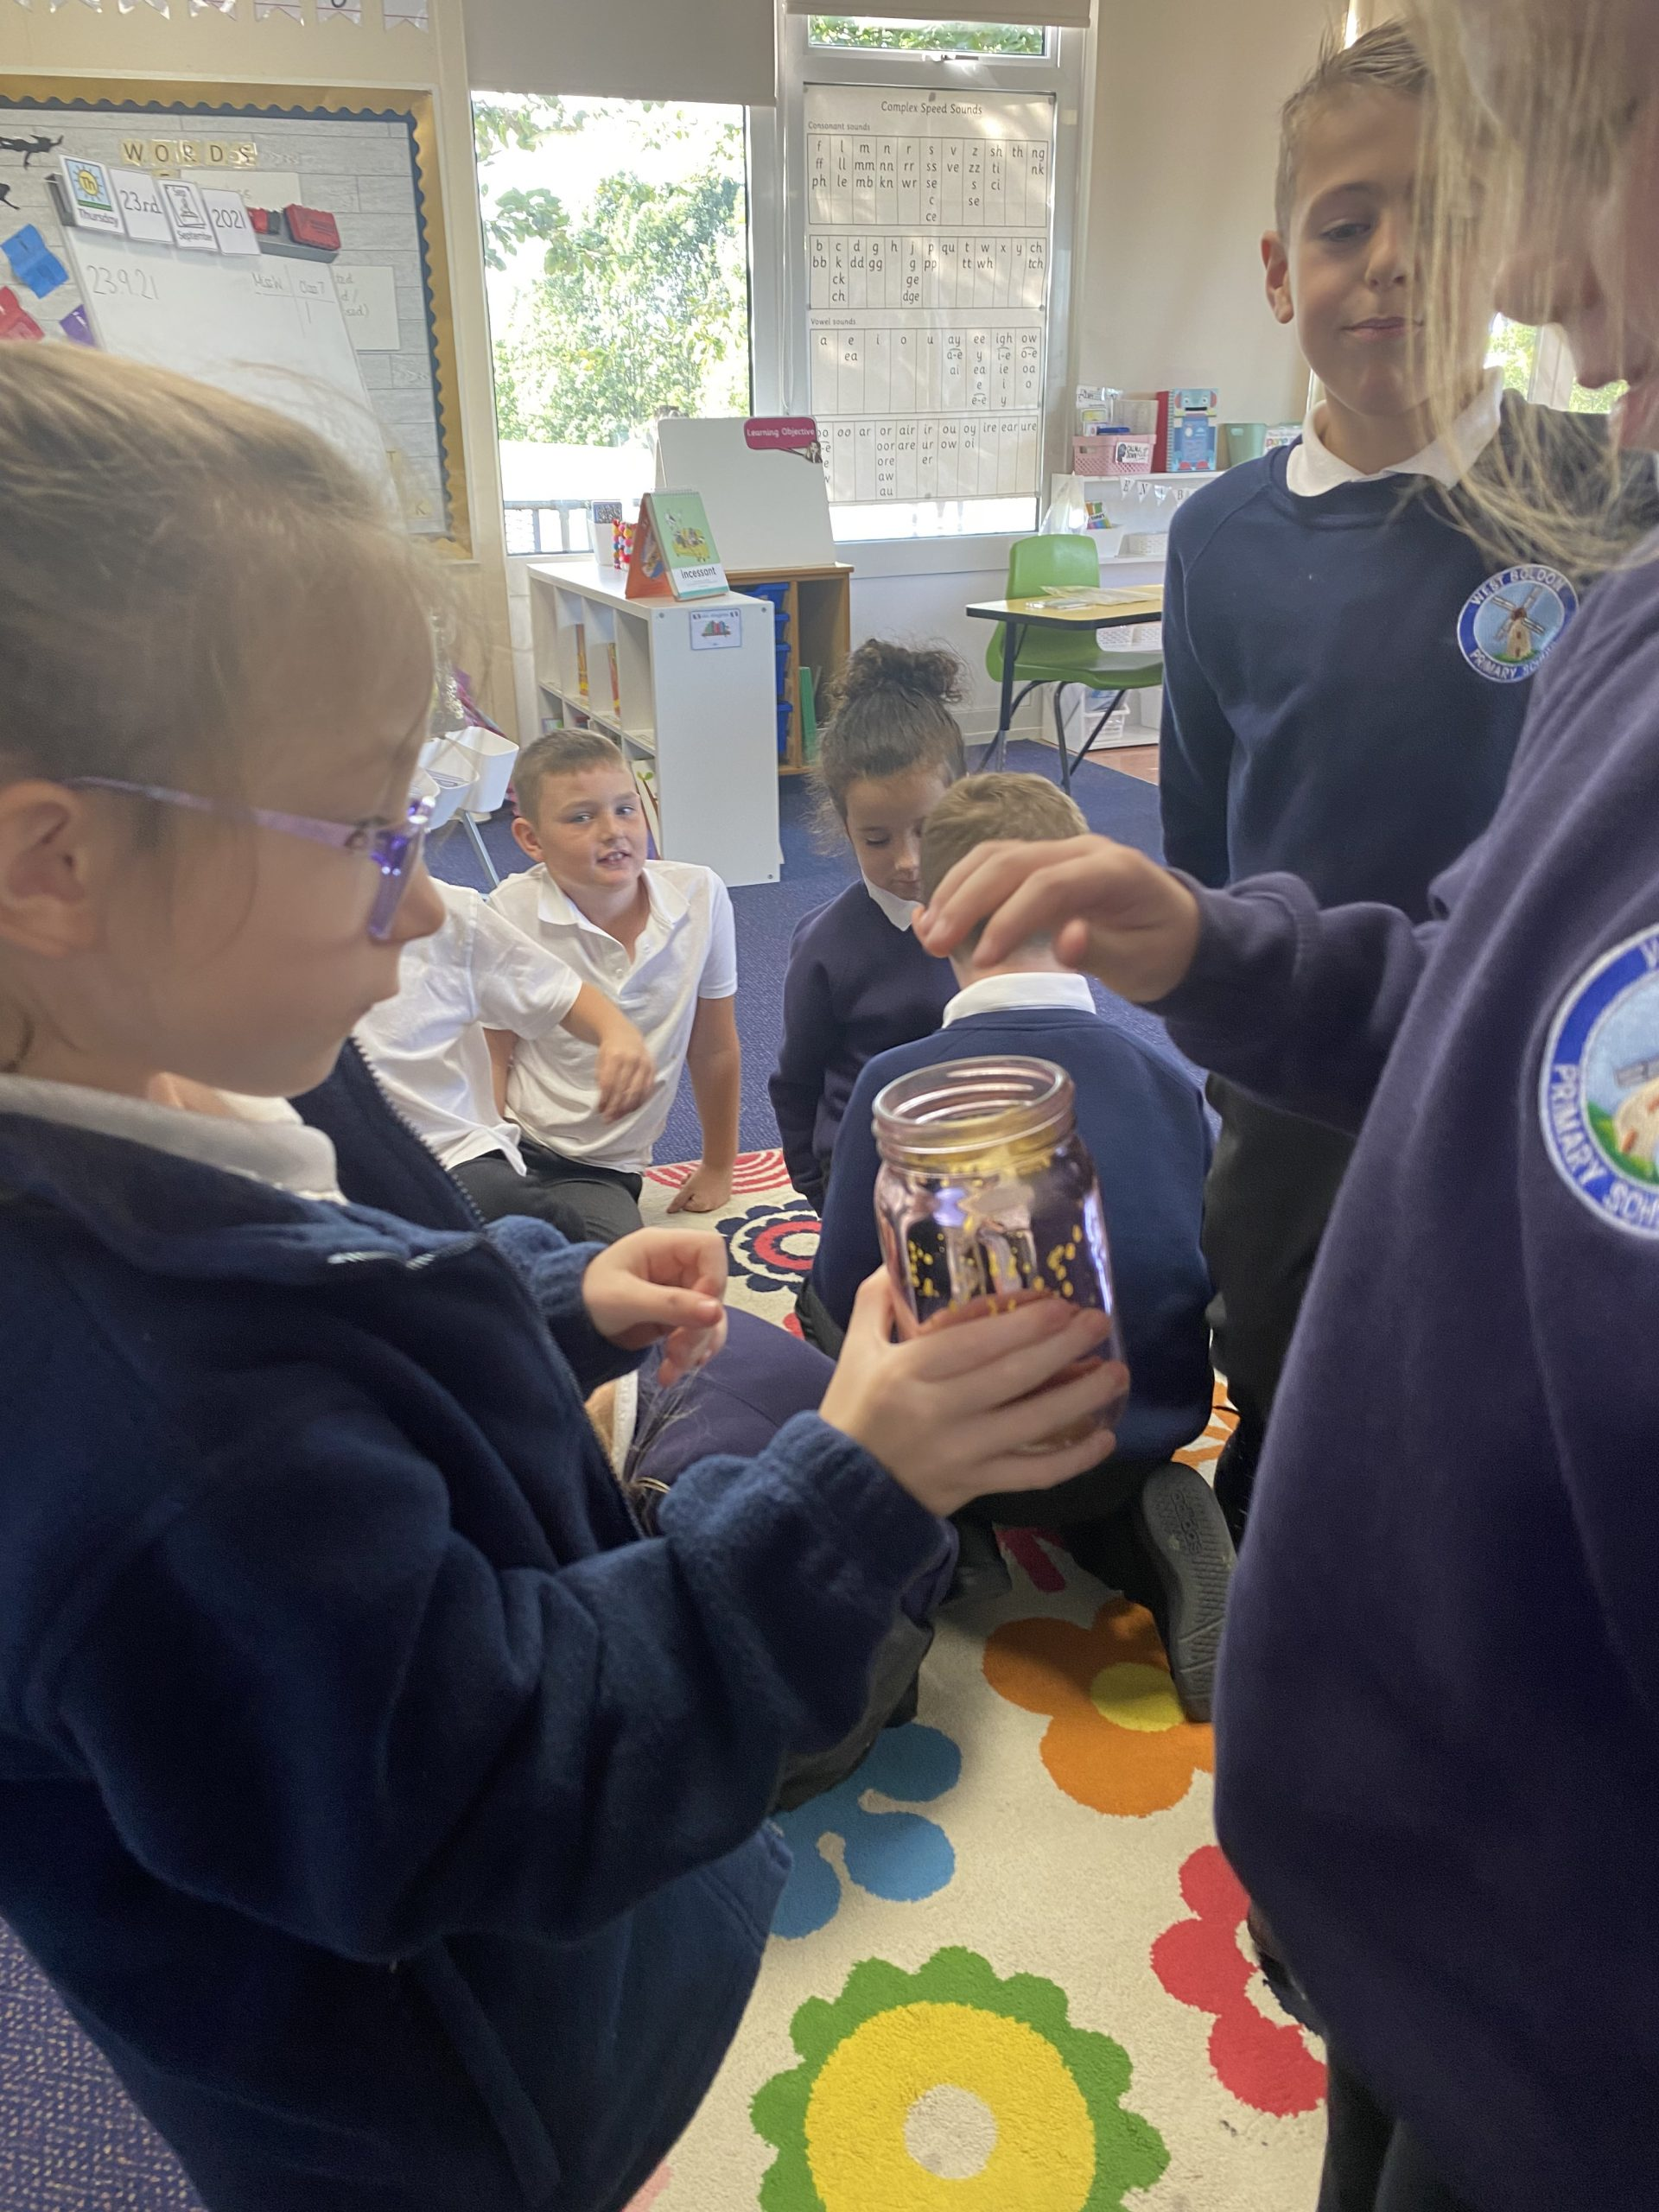 Year 3 putting their secrets in the secret jar